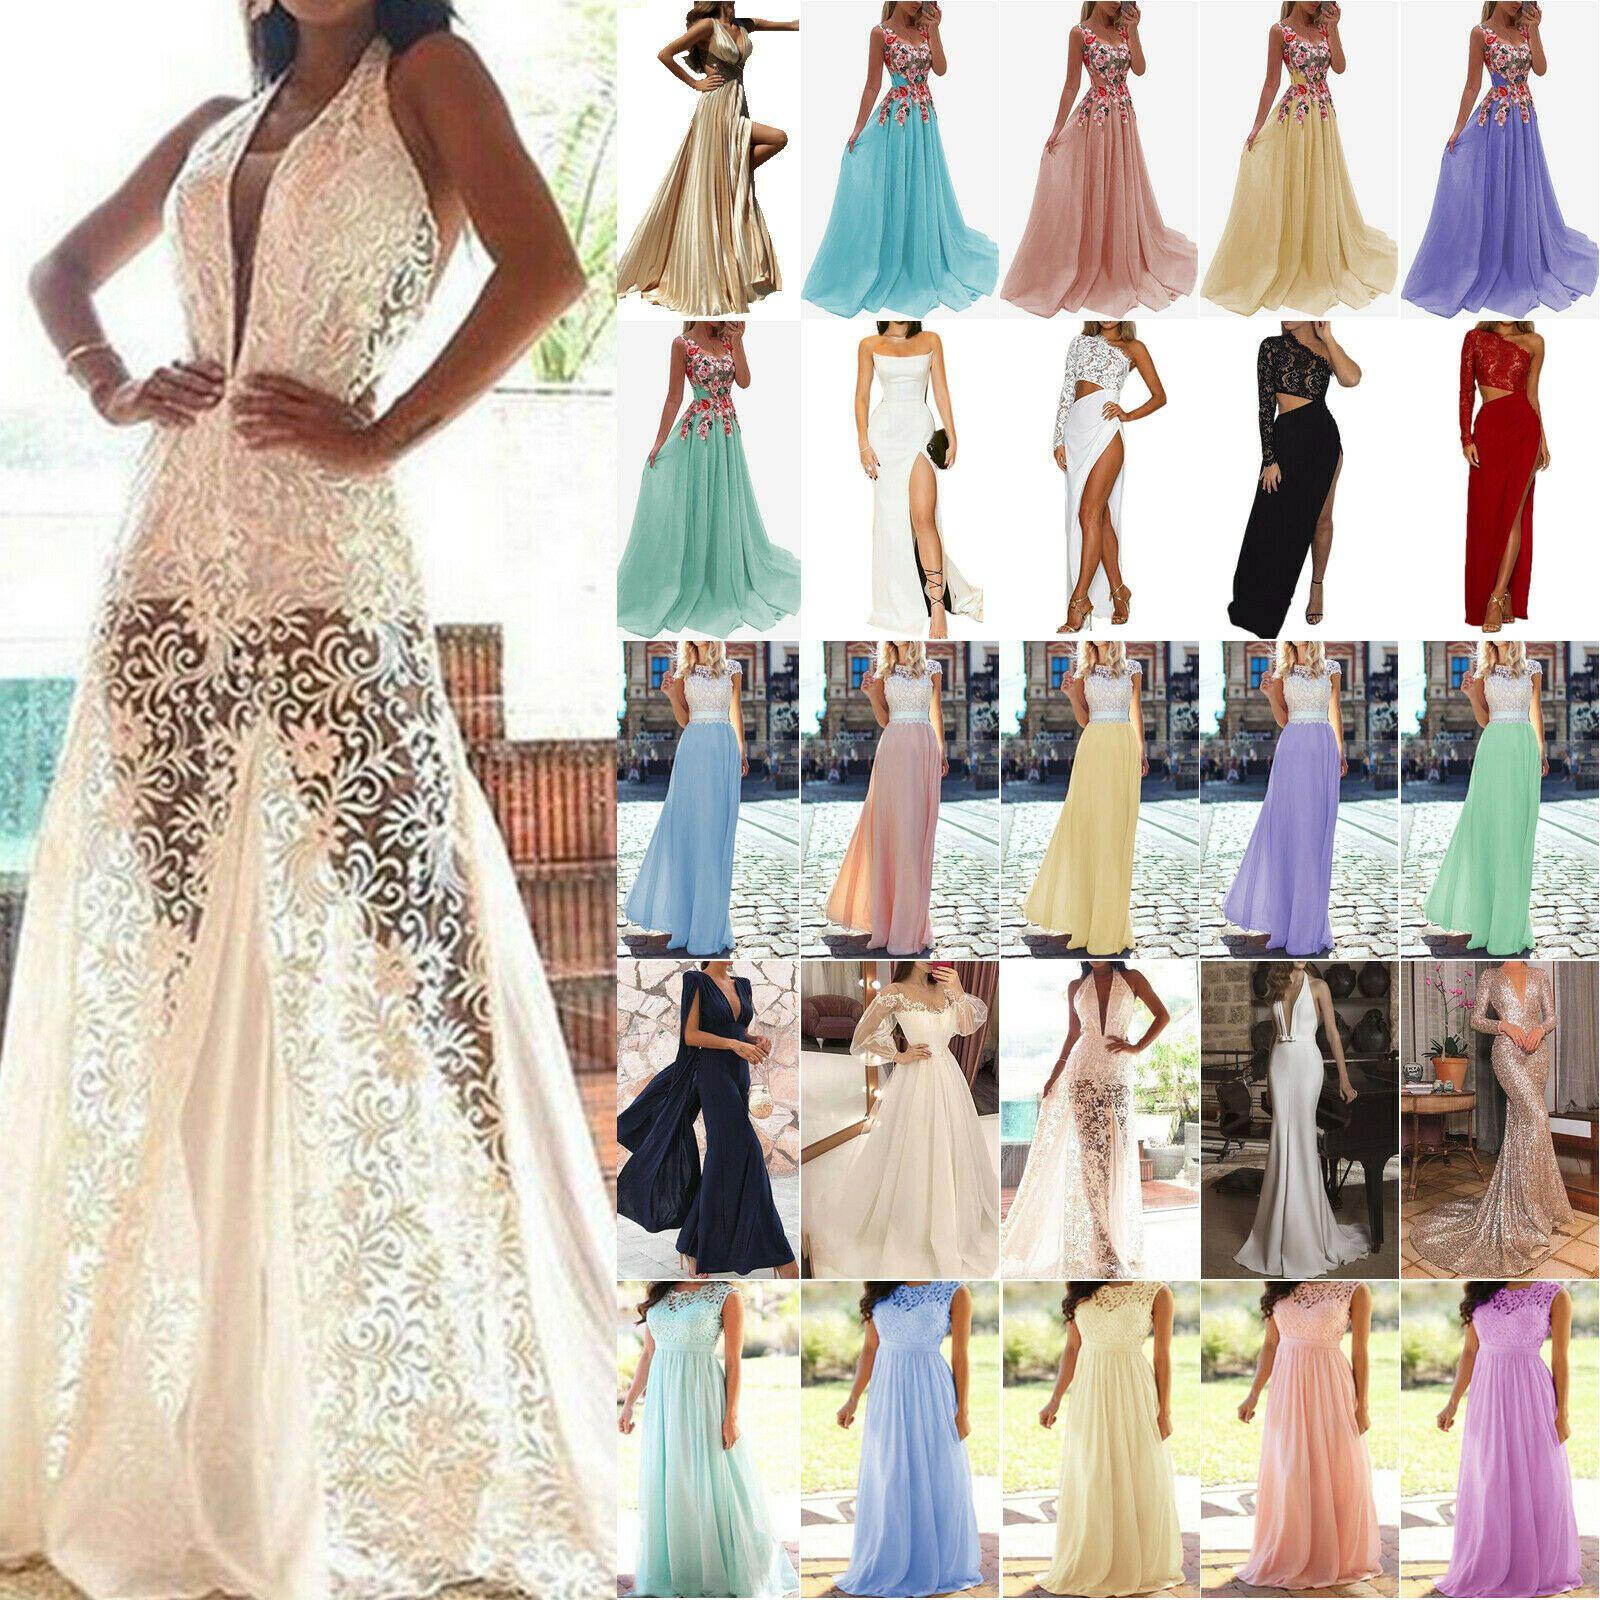 13 Elegant Maxikleid Abendkleid ÄrmelDesigner Top Maxikleid Abendkleid Design